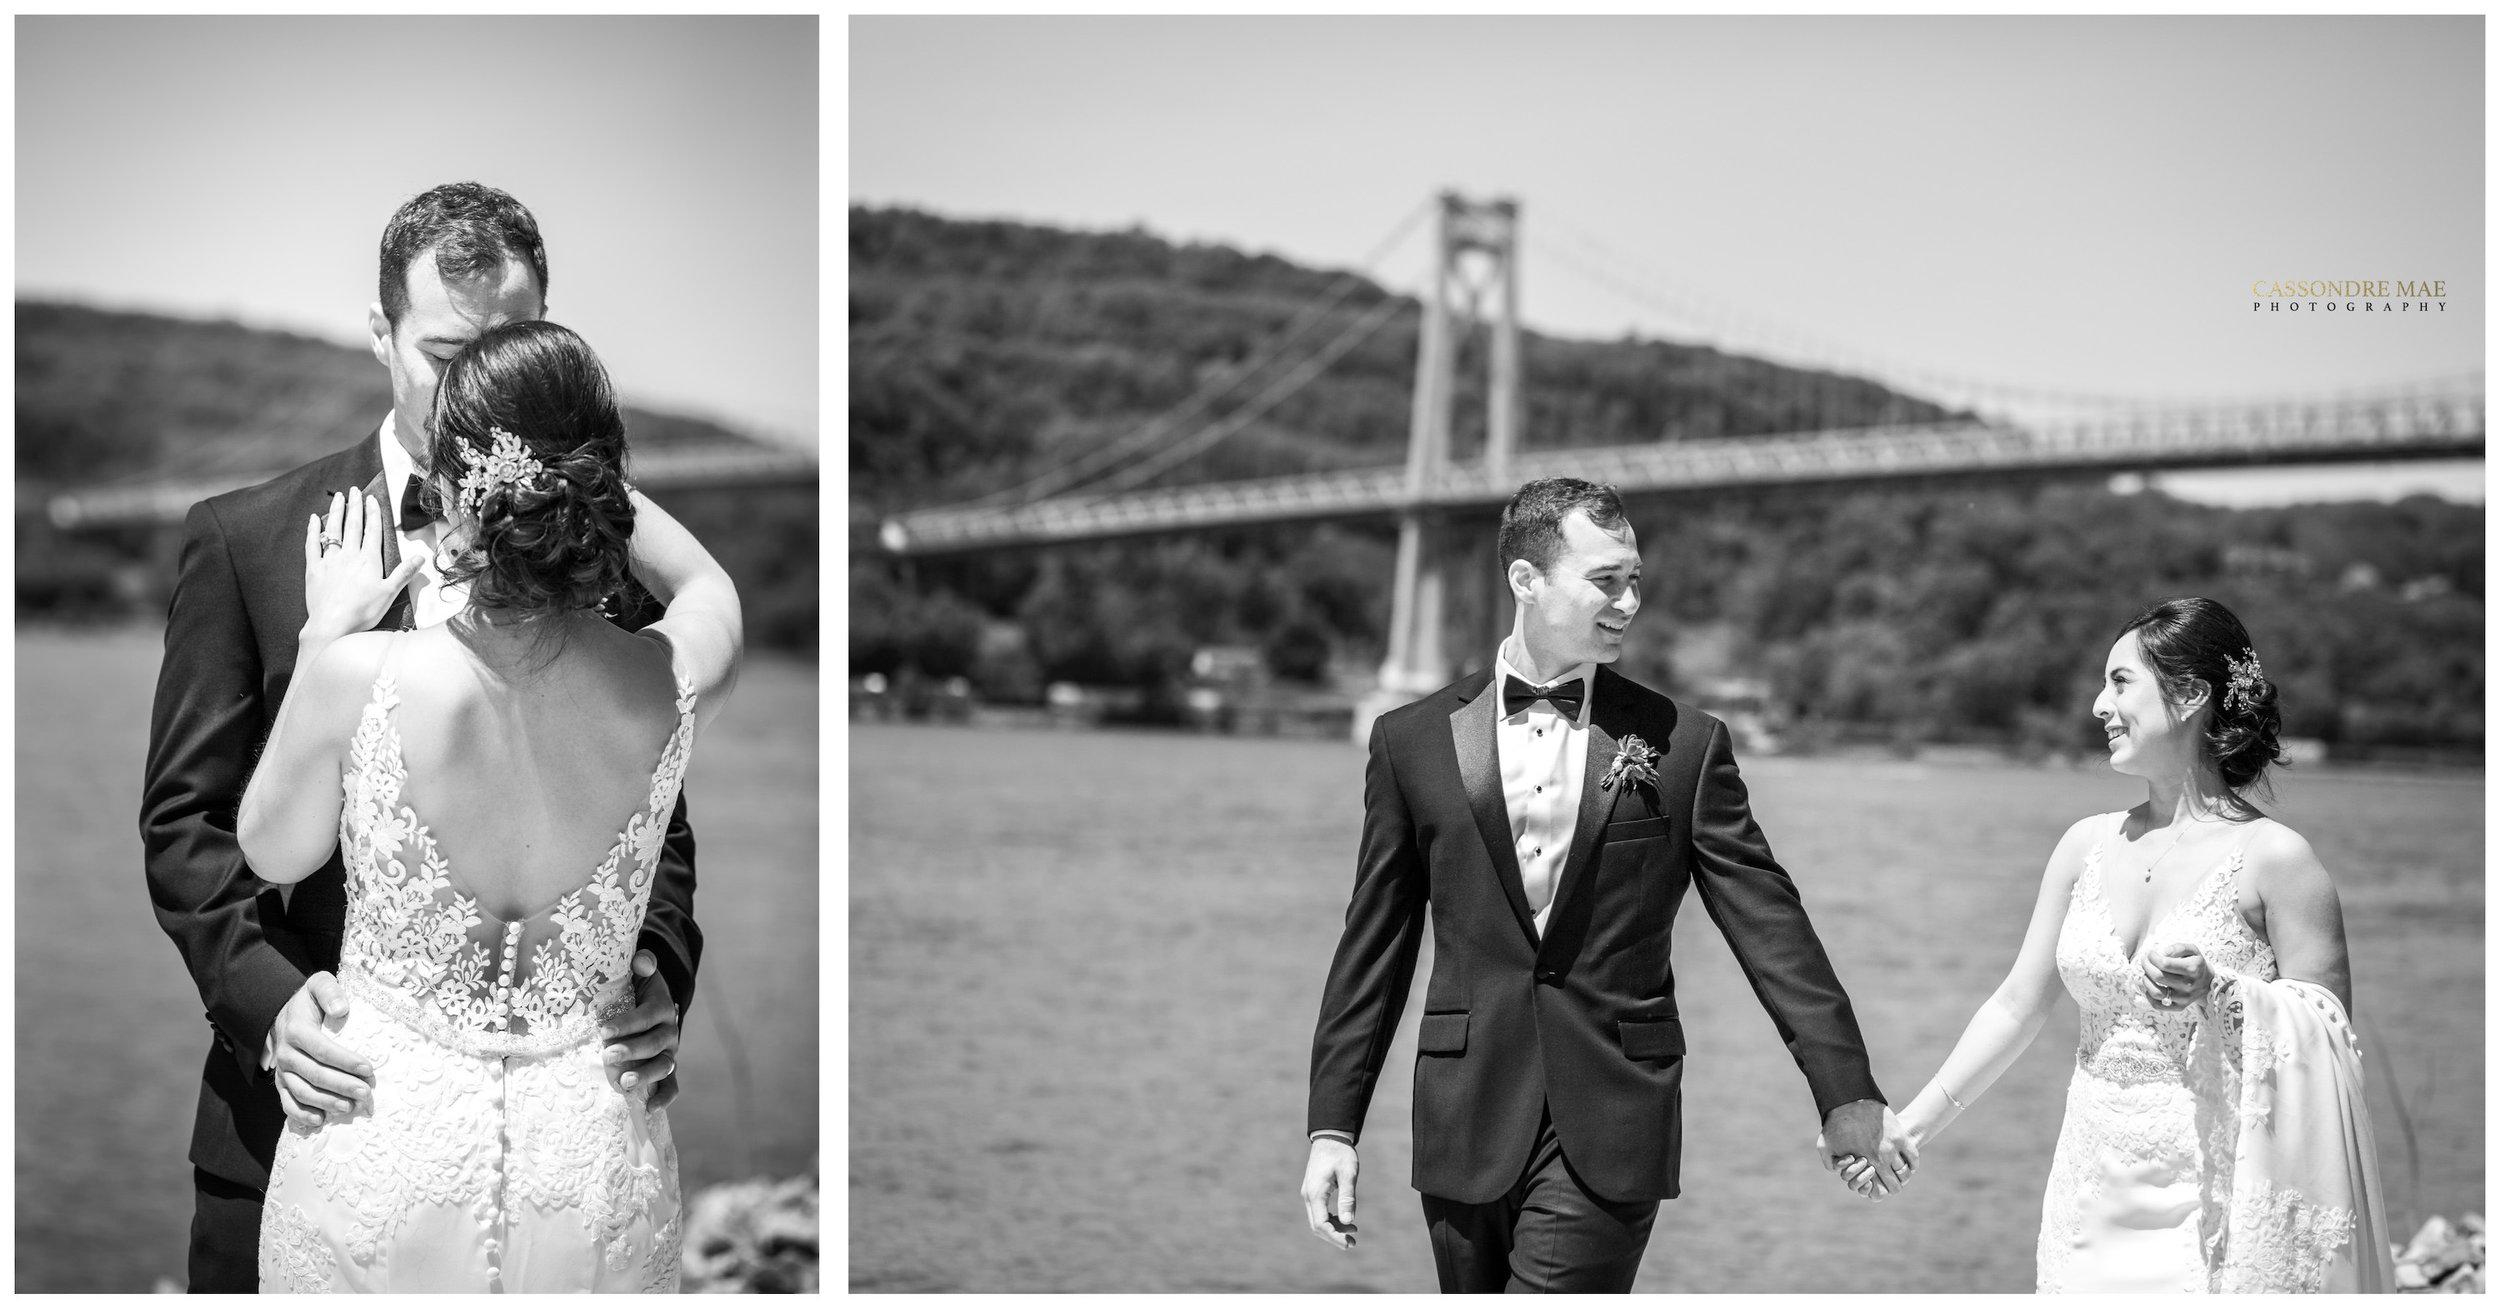 Cassondre Mae Photography The Grandview Poughkeepsie NY Wedding 17.jpg